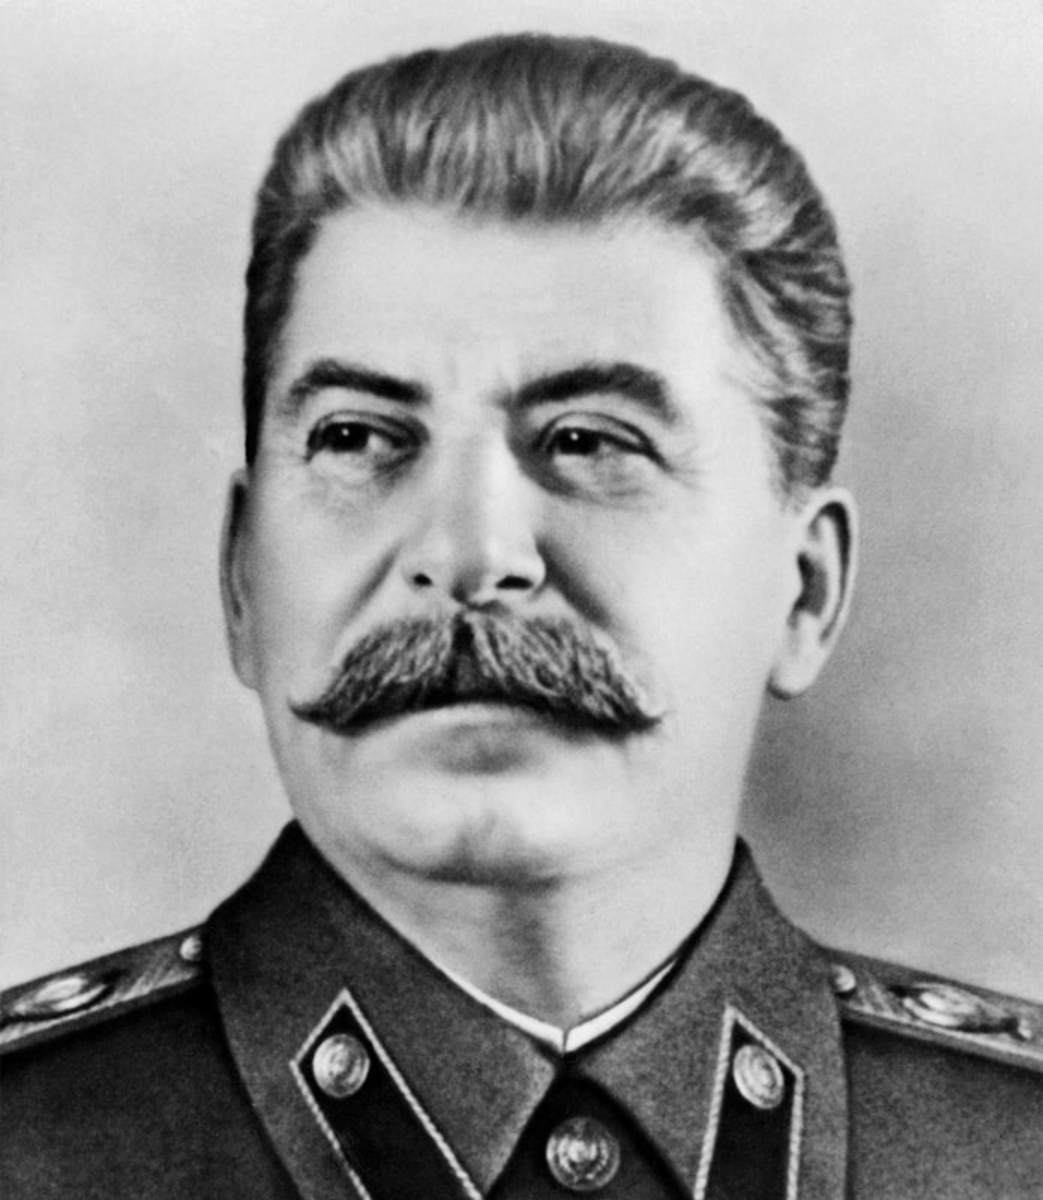 Portrait of Joseph Stalin during the mid-Twentieth Century.